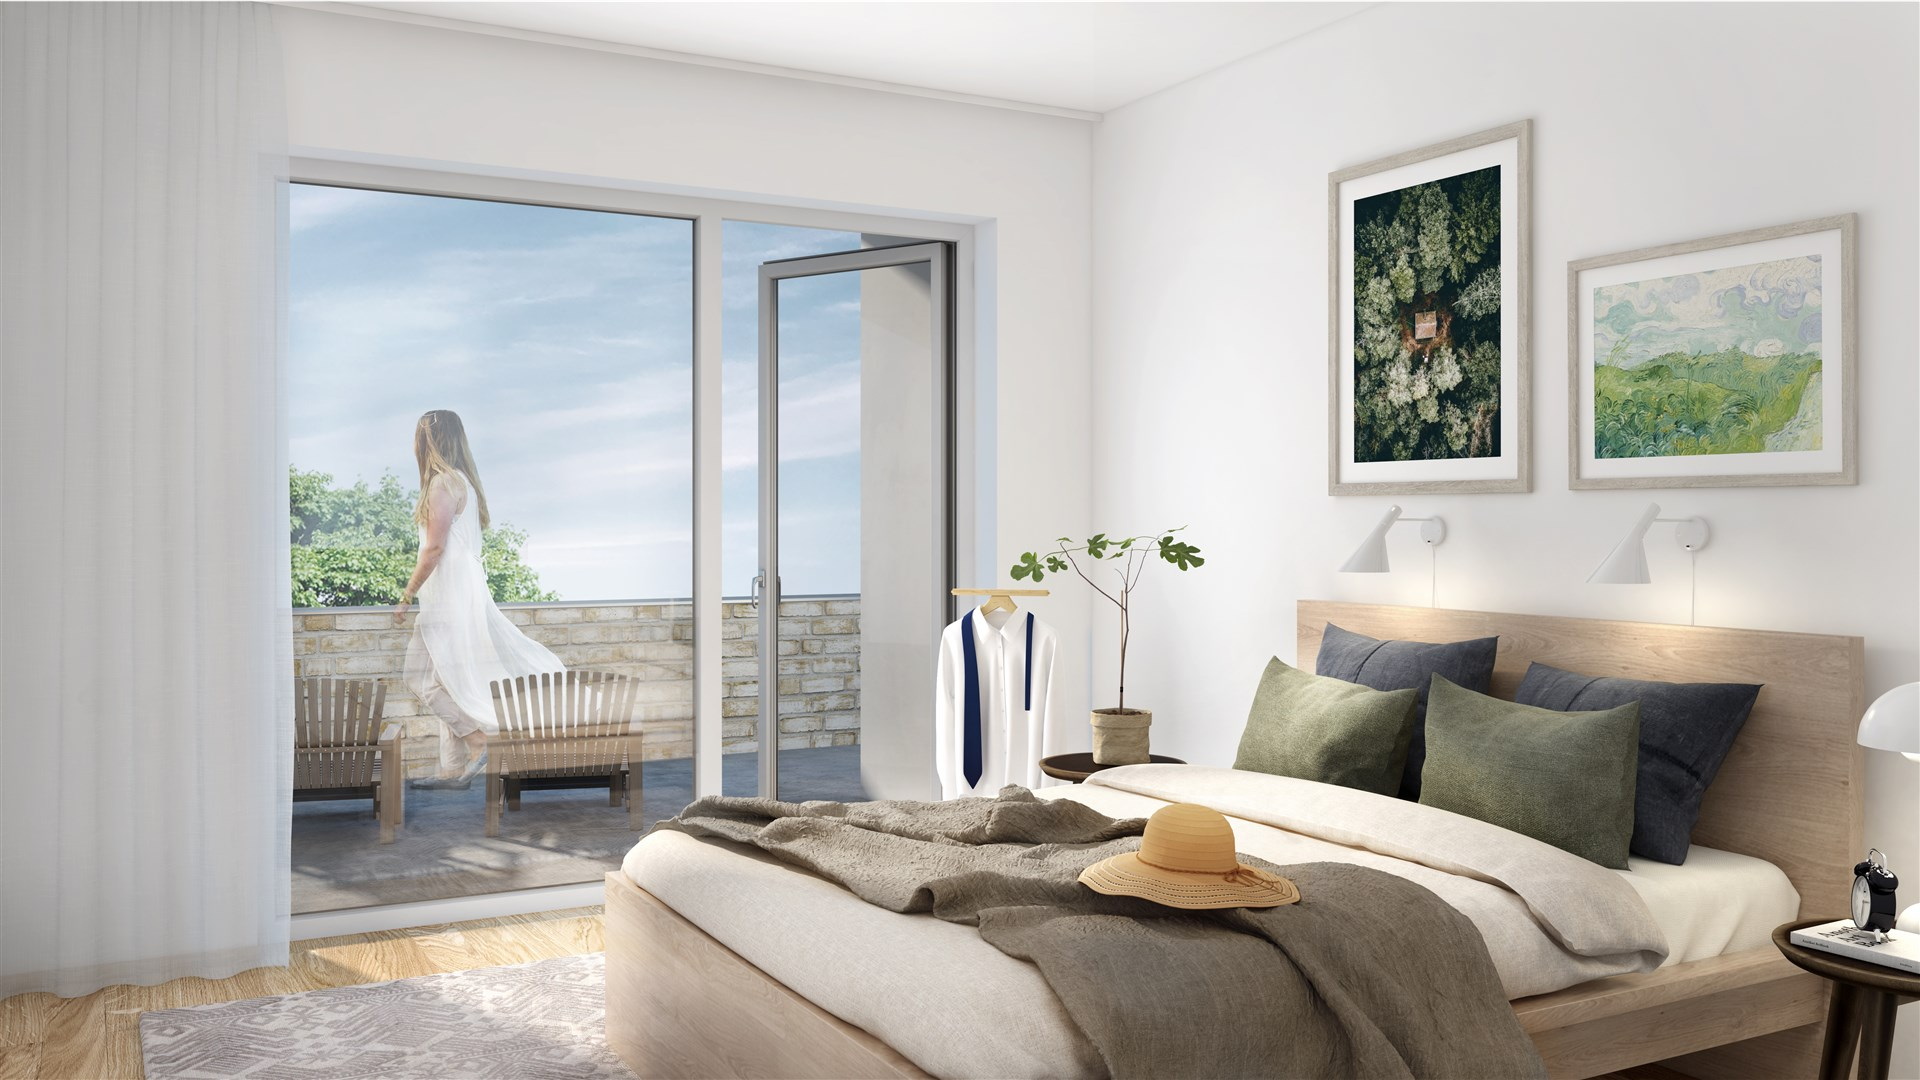 Illustration - sovrum, takvåning med terrass